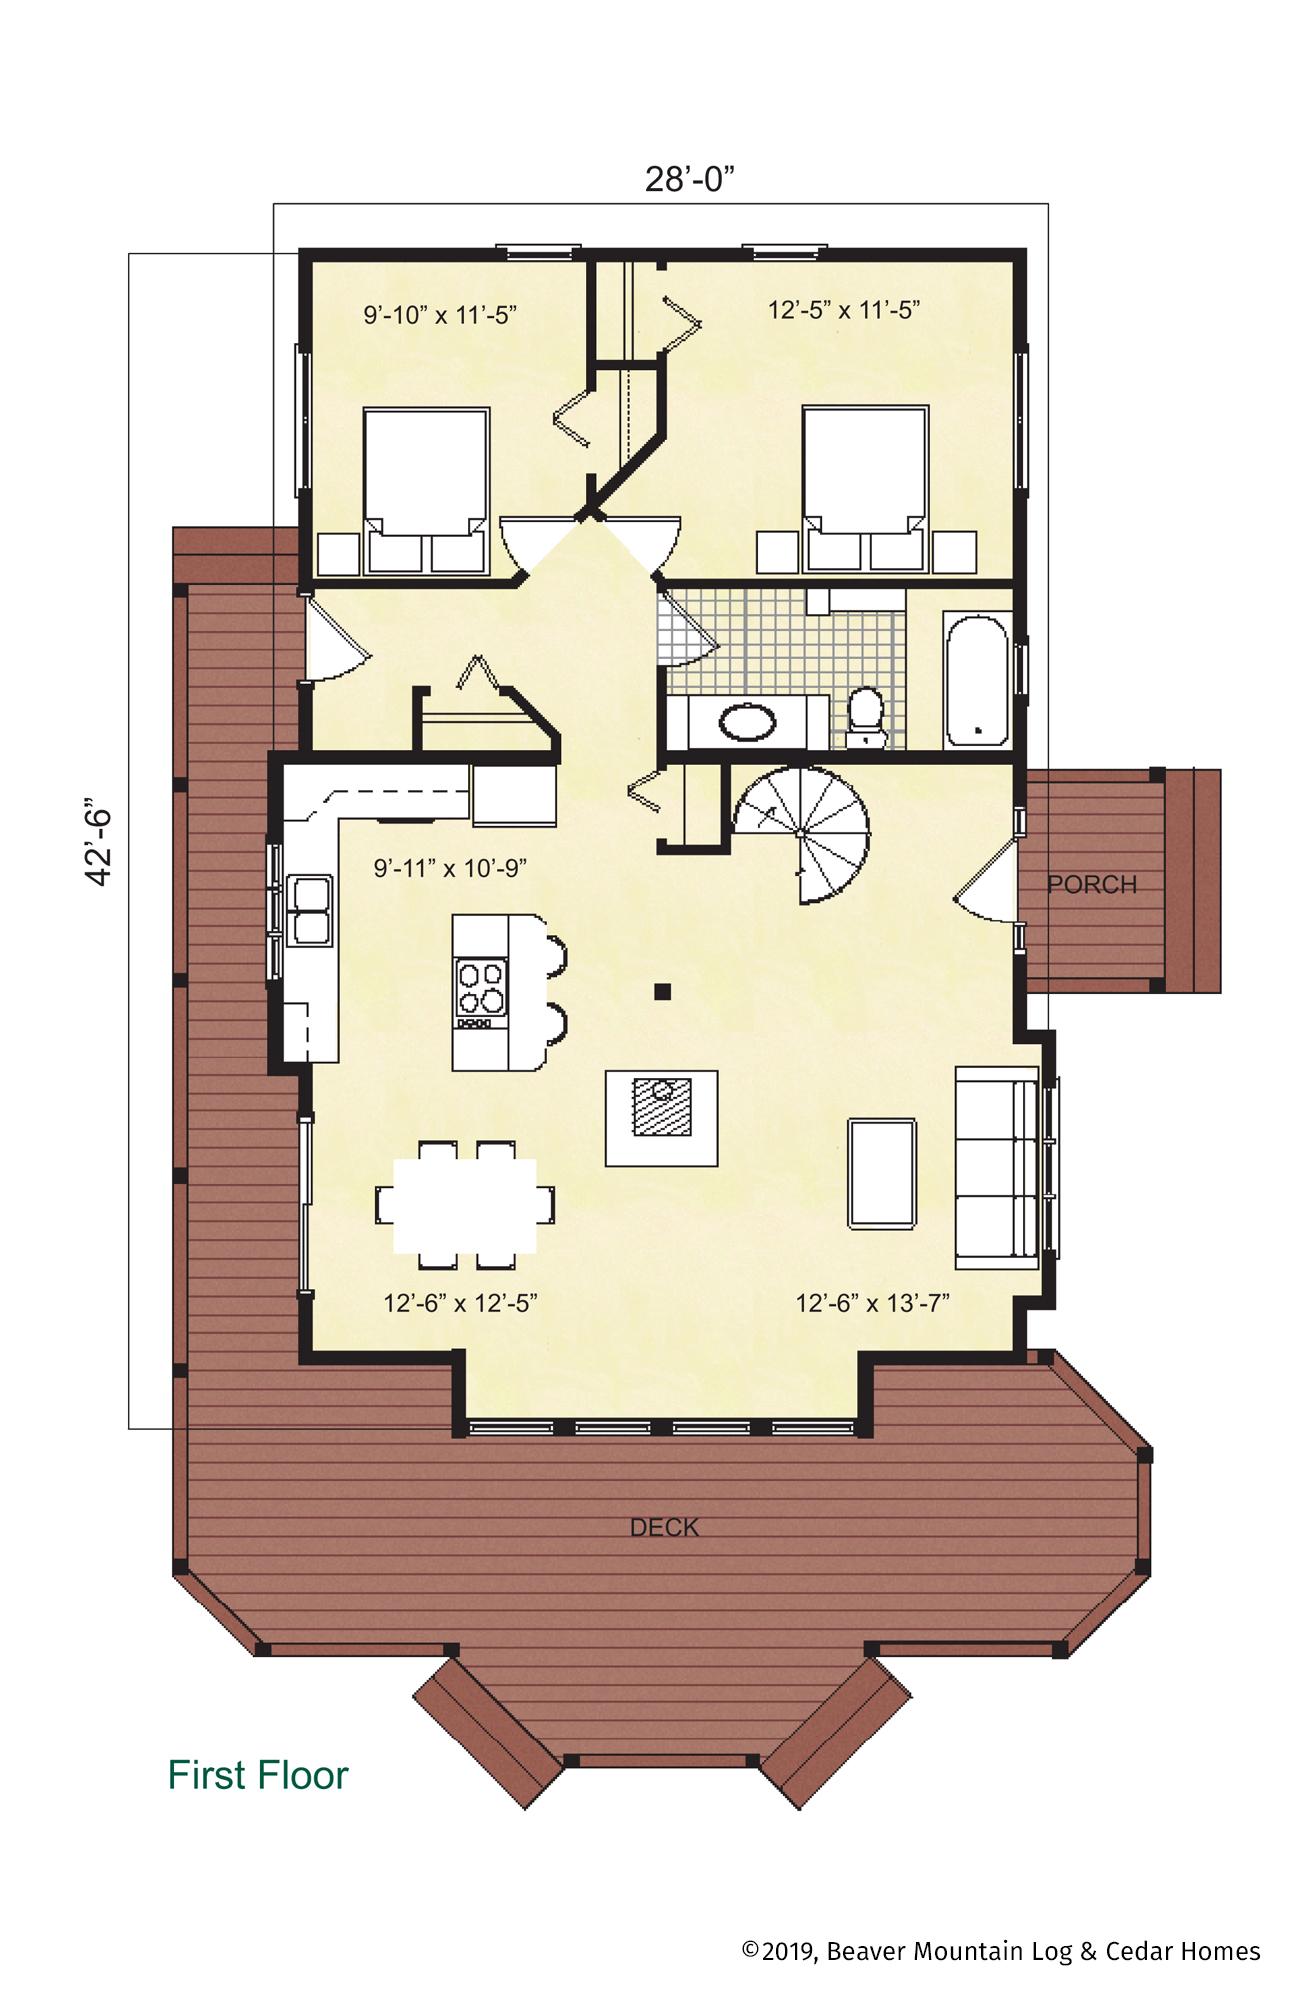 Beaver Mountain Log Homes Cedar Ridge Timber Home Main Level Floor Plan